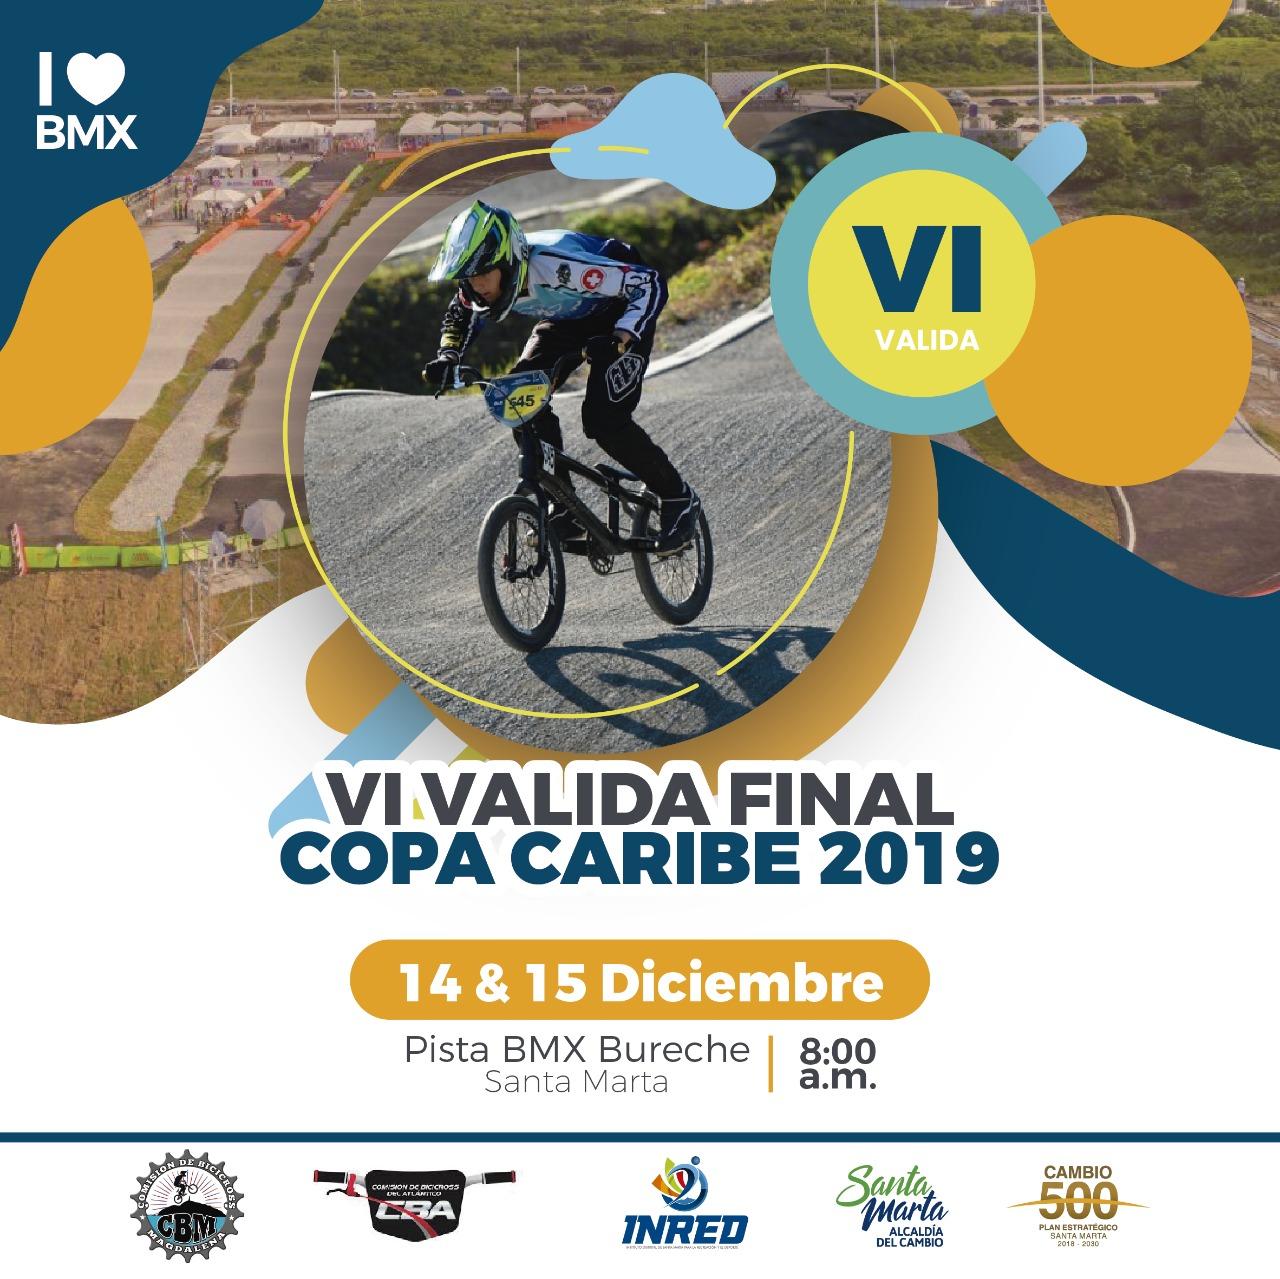 Este fin de semana se realizará la VI valida final Copa Caribe de BMX 2019